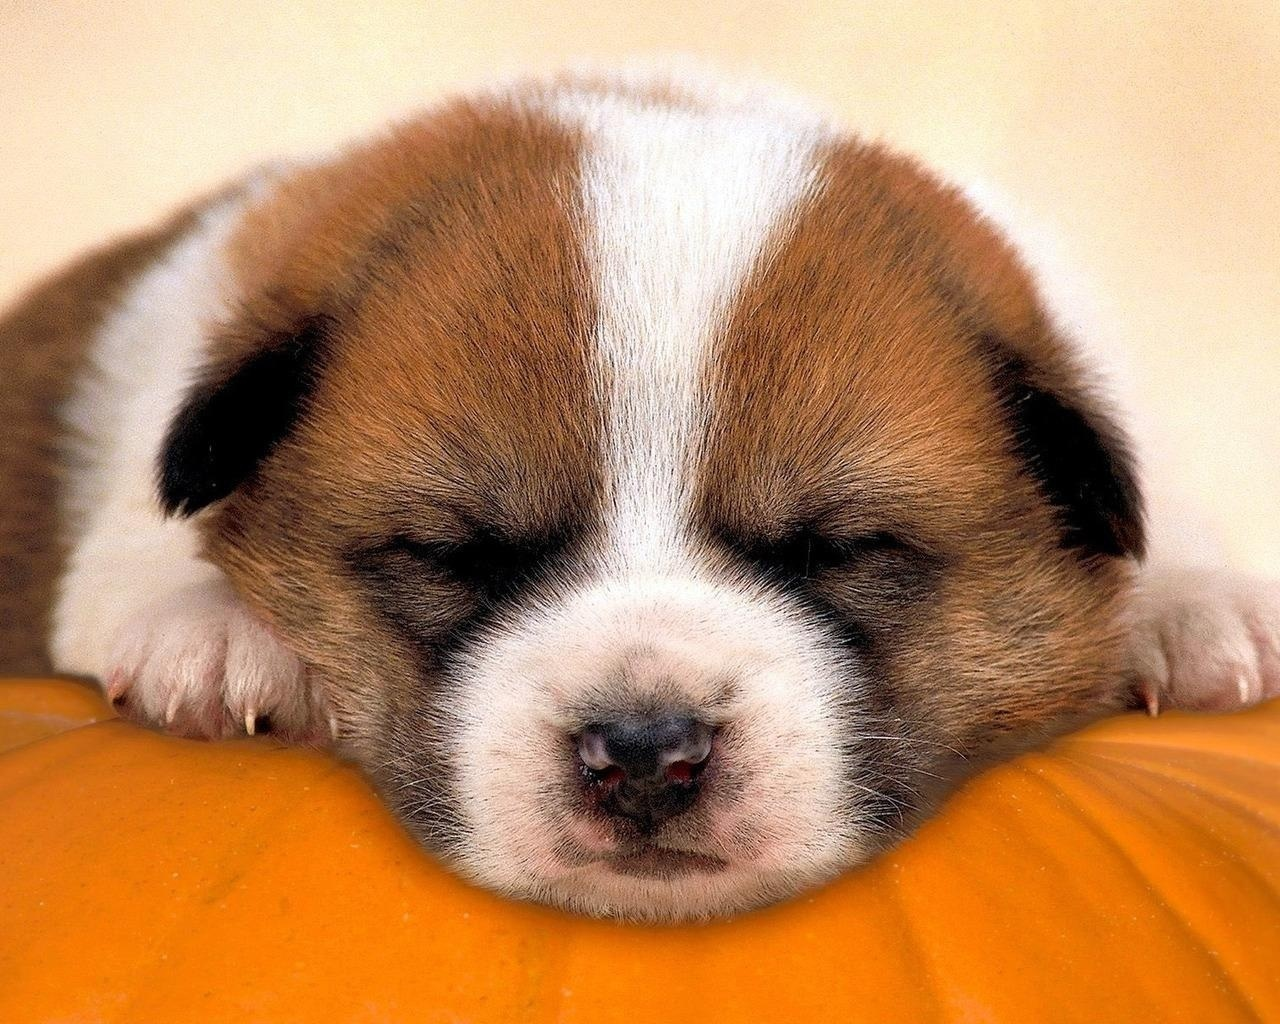 Domestic animals sleepy pup